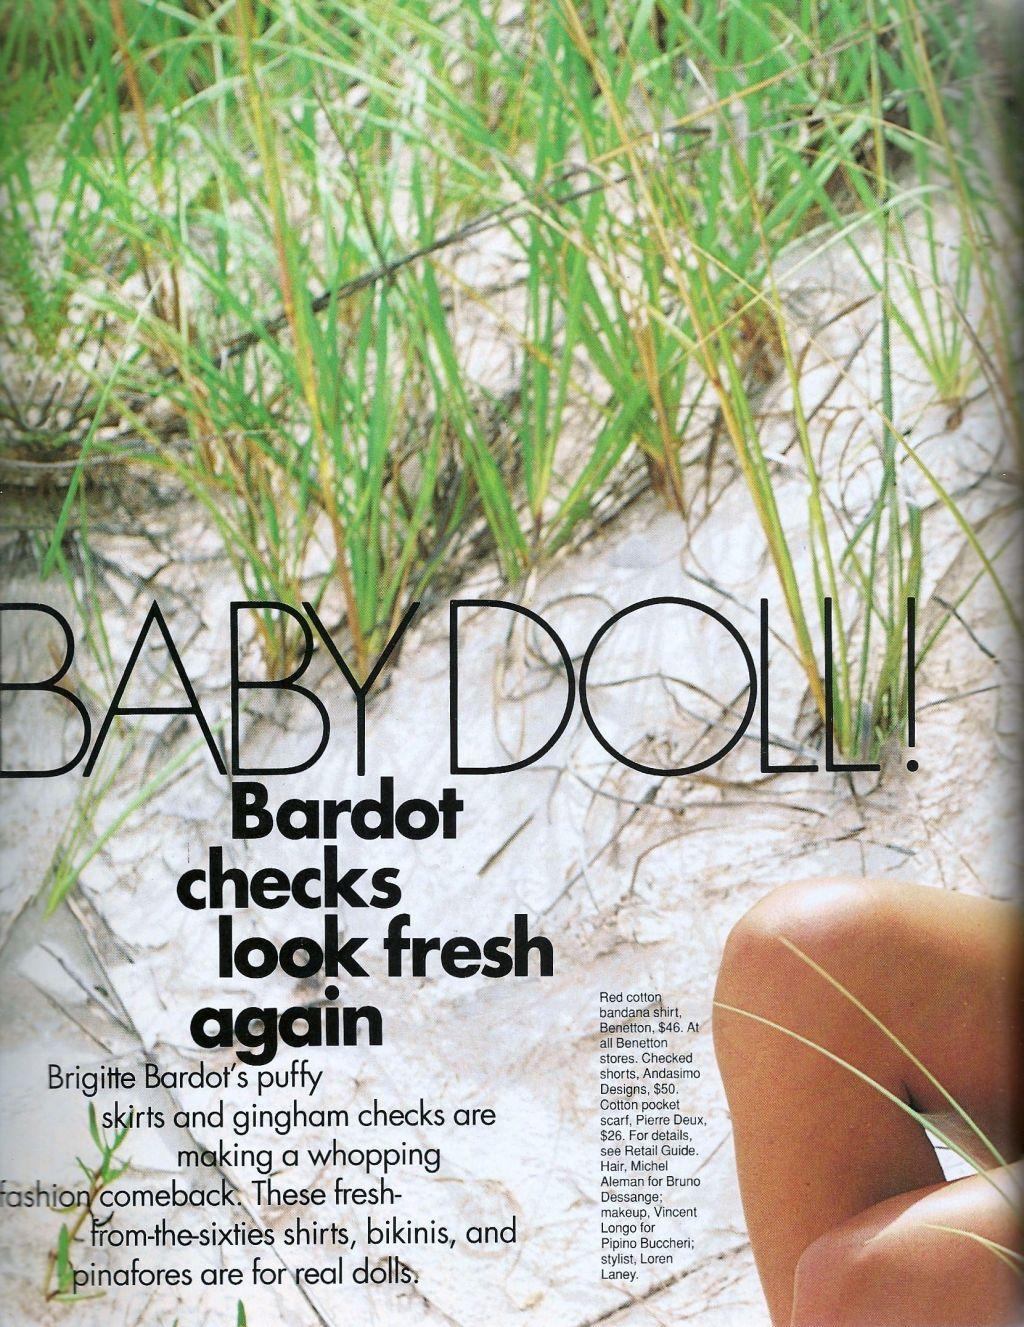 Elle (US) January 1991 | Baby Doll 01.jpg